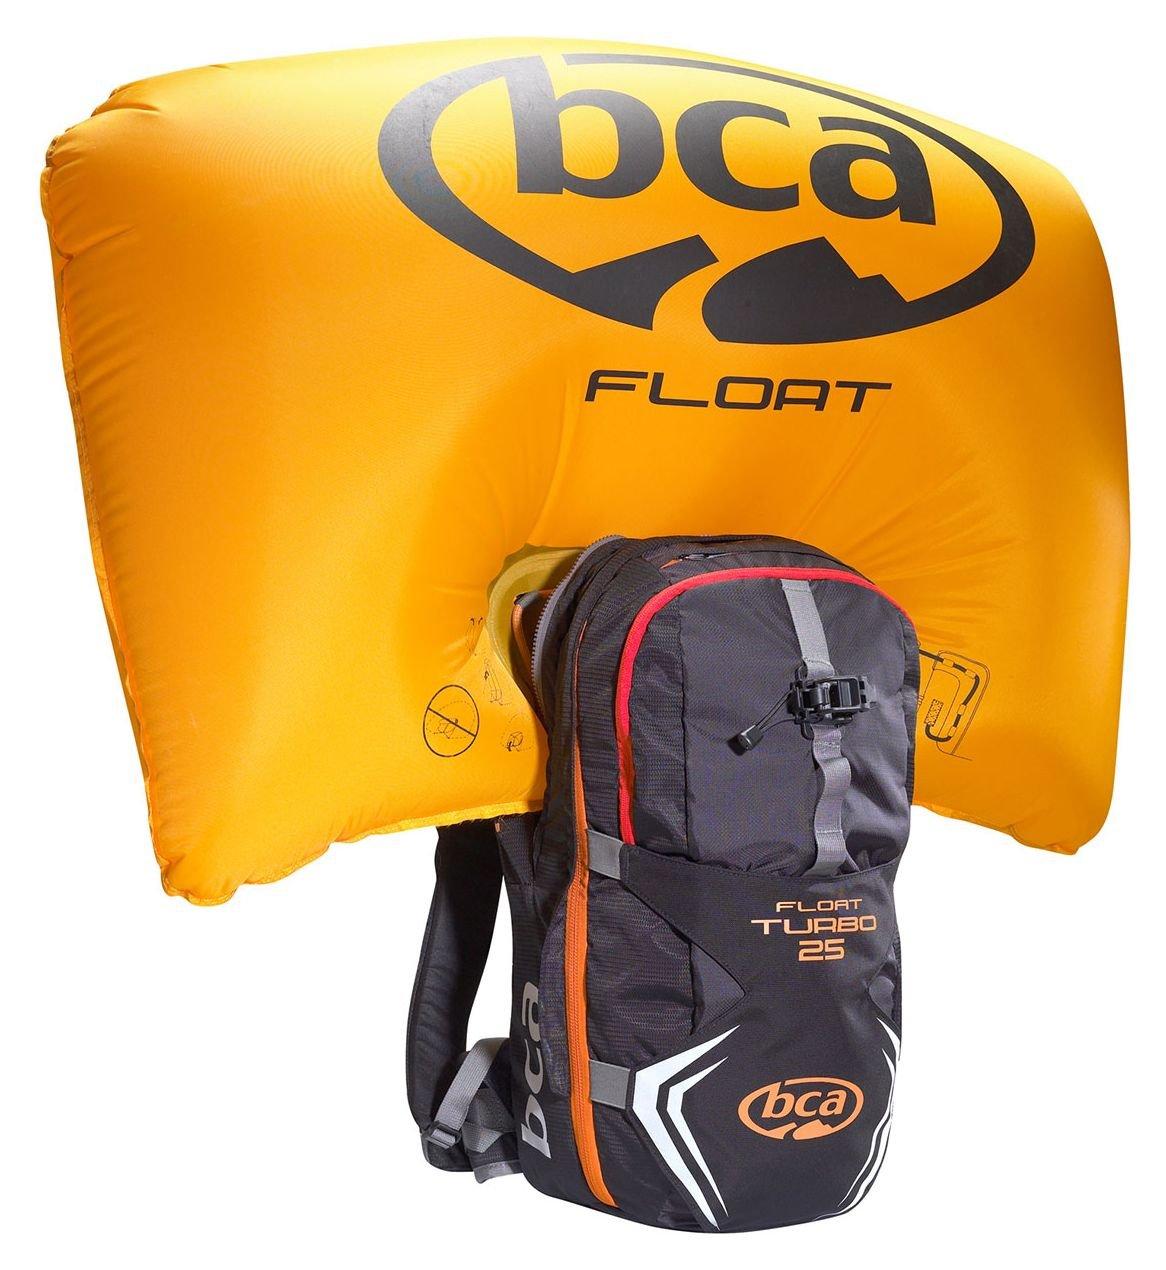 Backcountry B019ECQ8SC Access Float 25ターボAvalancheエアバッグ Access – Backcountry ブラック B019ECQ8SC, タツヤマムラ:a8843a58 --- ero-shop-kupidon.ru